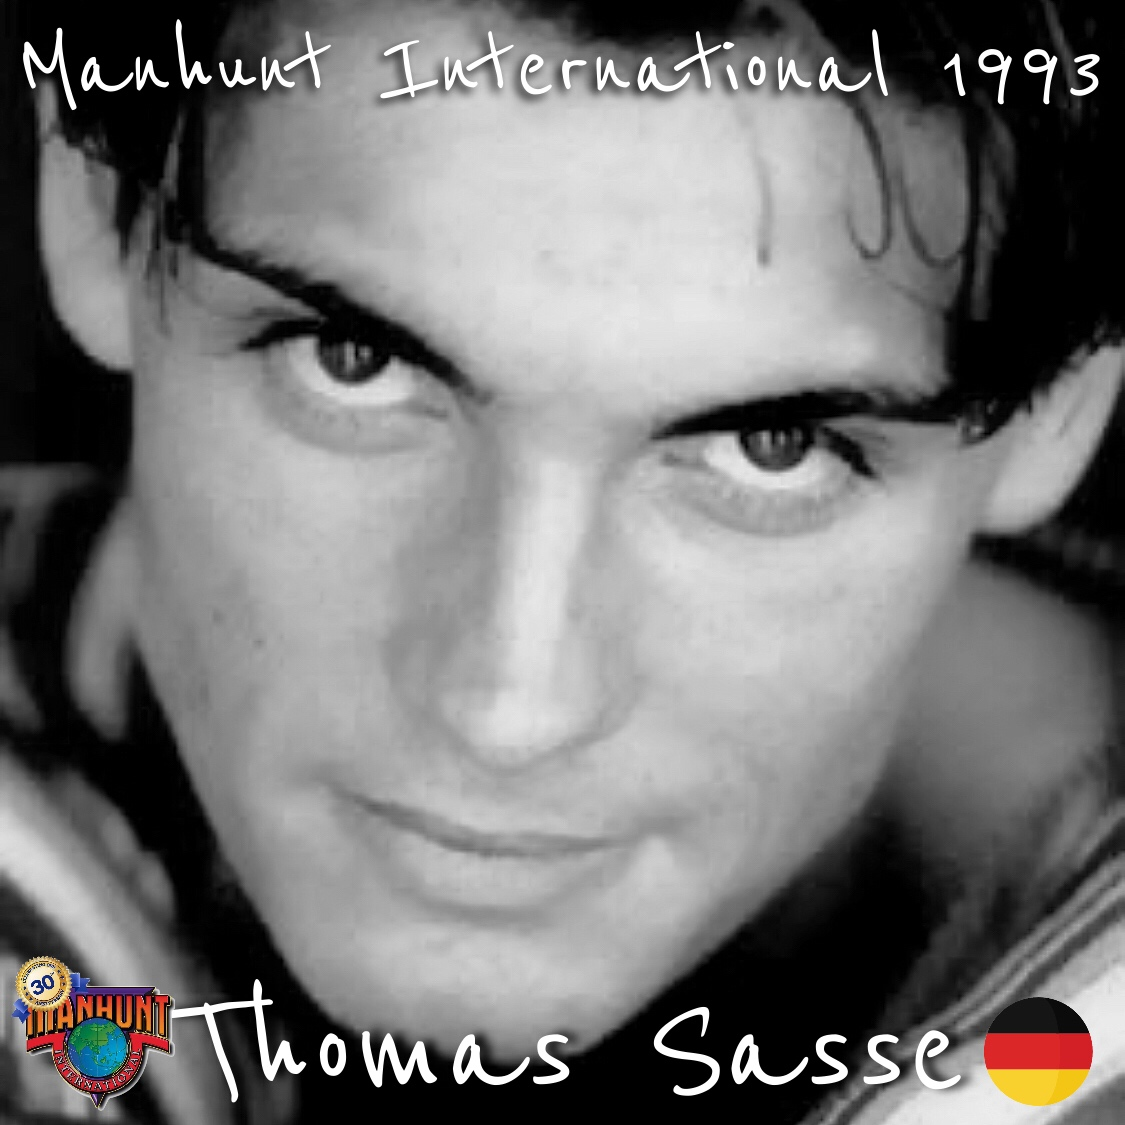 thomas sasse, manhunt international 1993. Enligh12